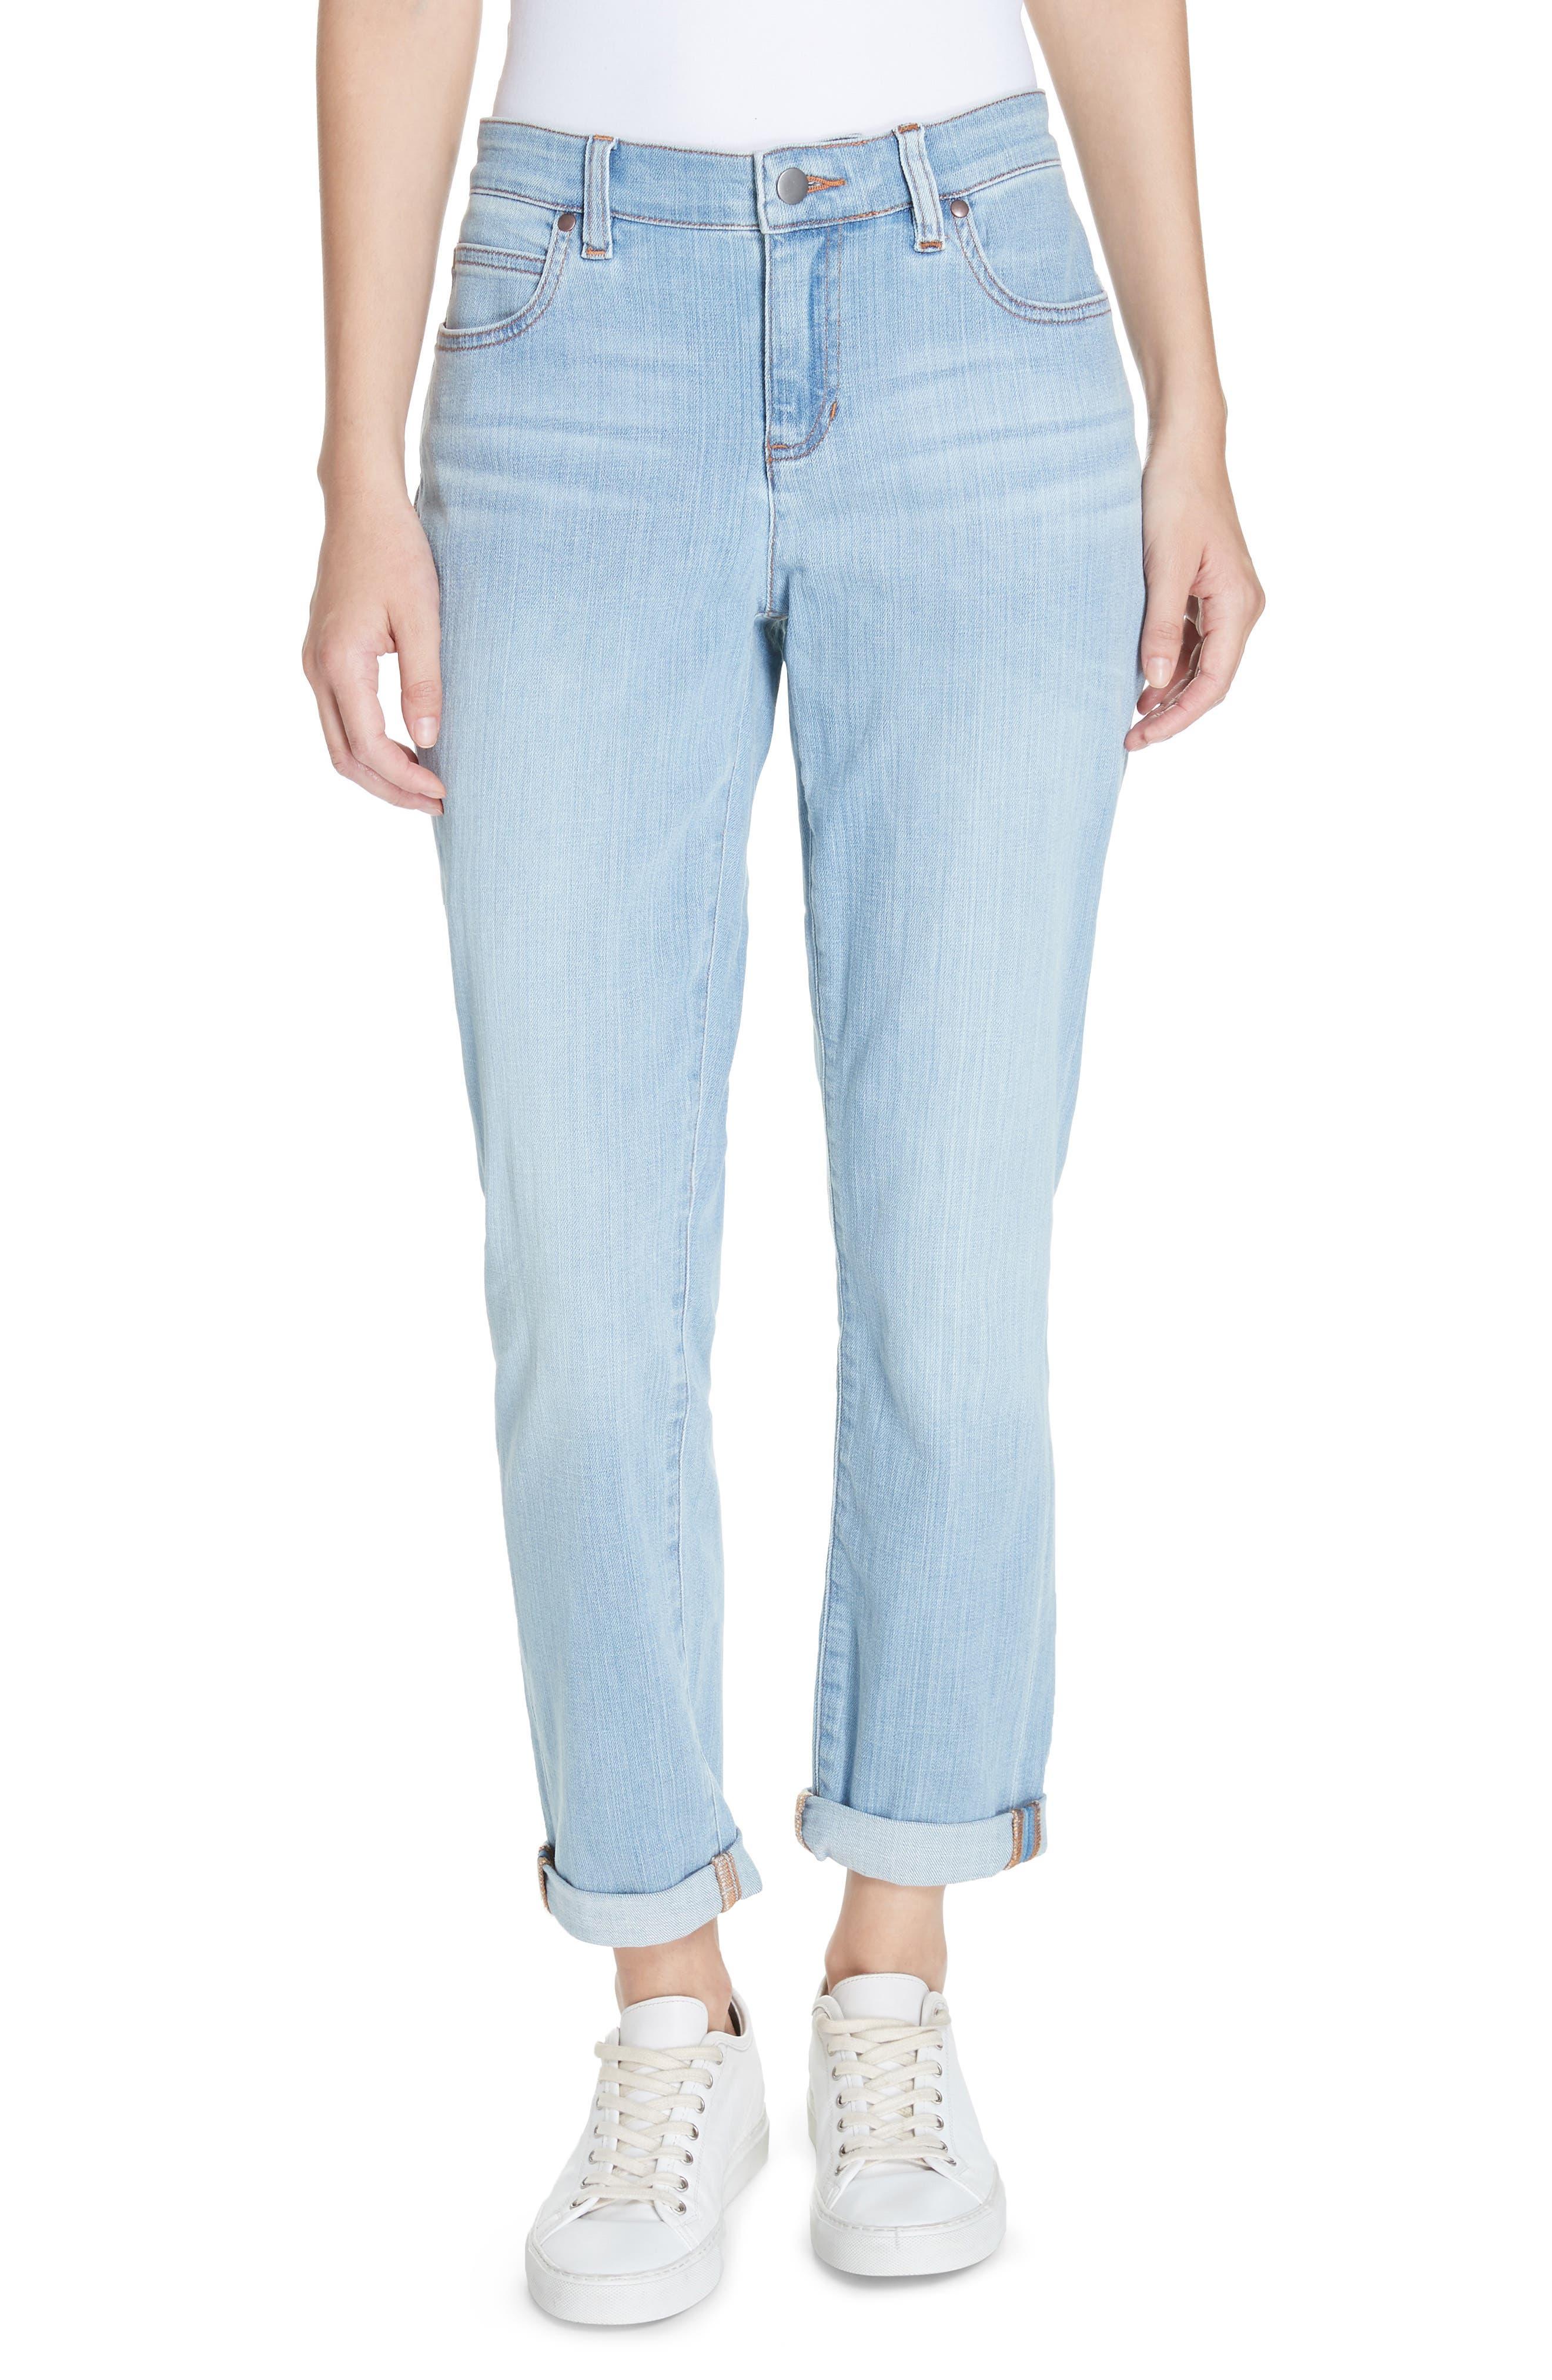 EILEEN FISHER, Organic Cotton Boyfriend Jeans, Main thumbnail 1, color, ICE BLUE